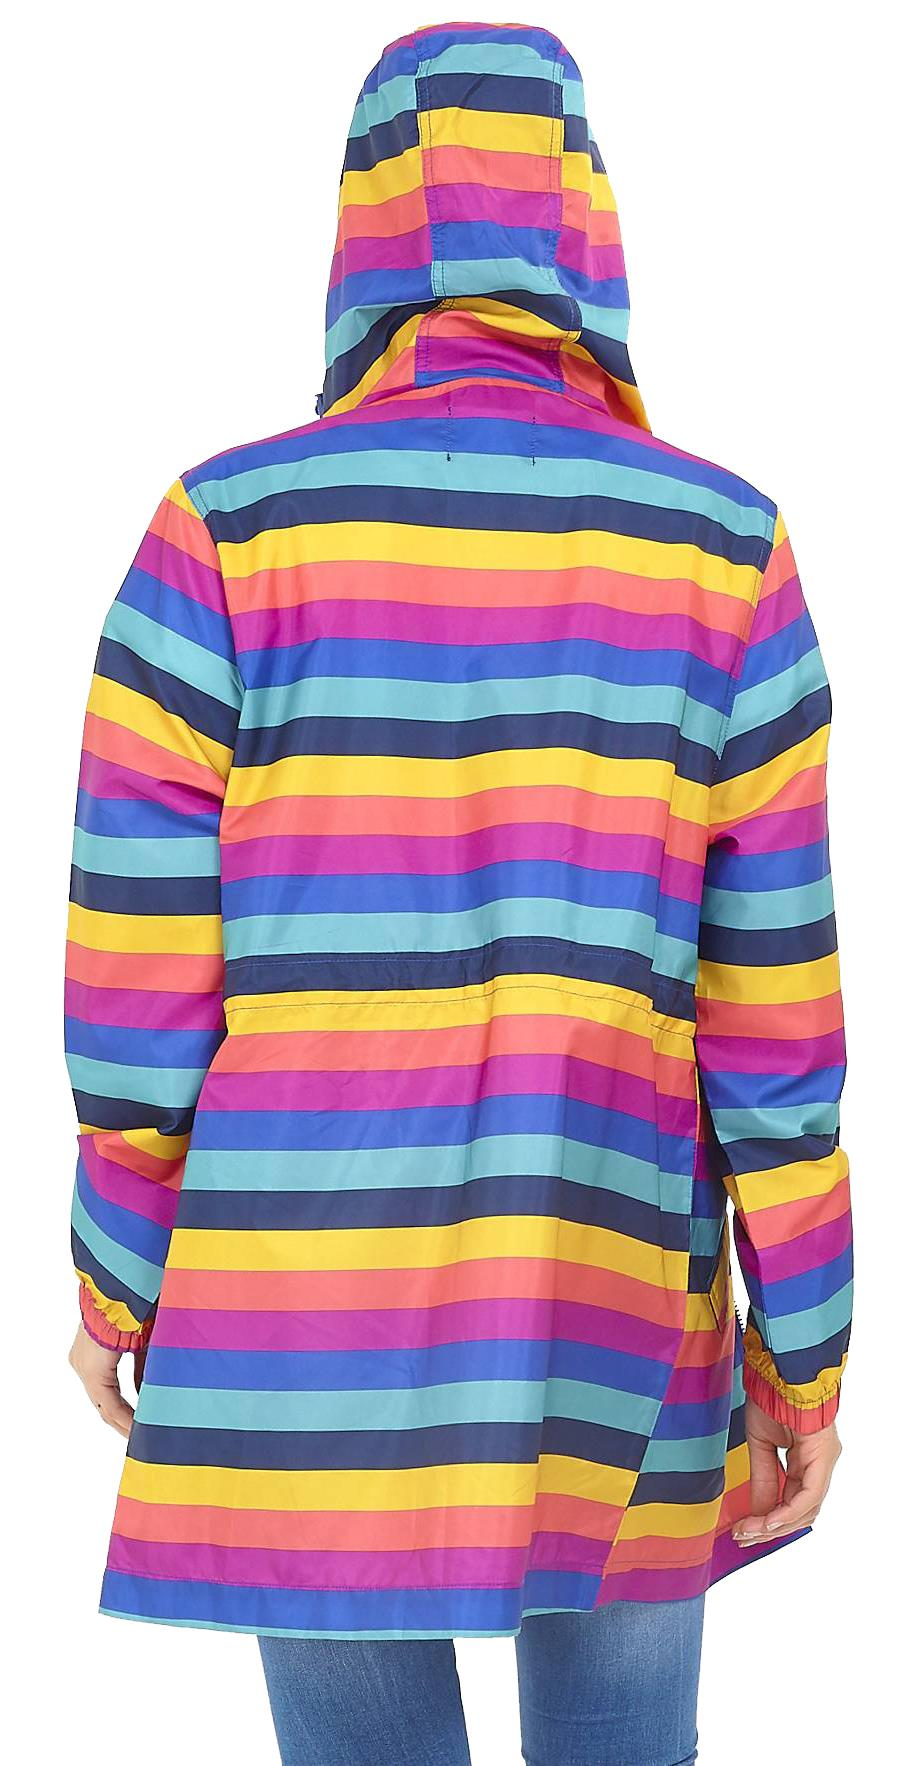 Womens Rainbow Stripe Print Fishtail Festival Hooded Mac Raincoat Jacket